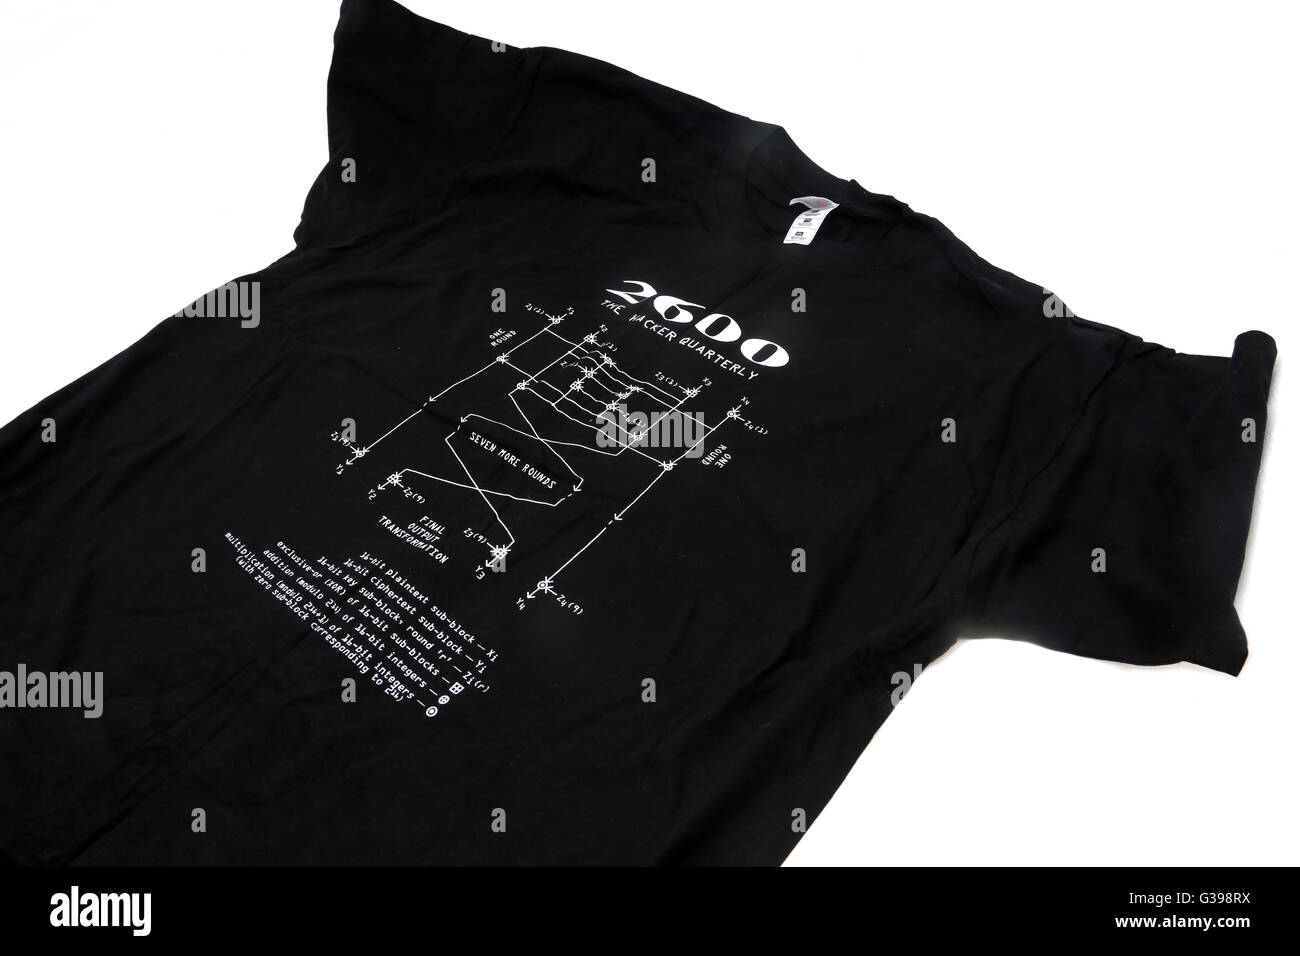 2600 The Hacker Quarterly T-Shirt - Stock Image